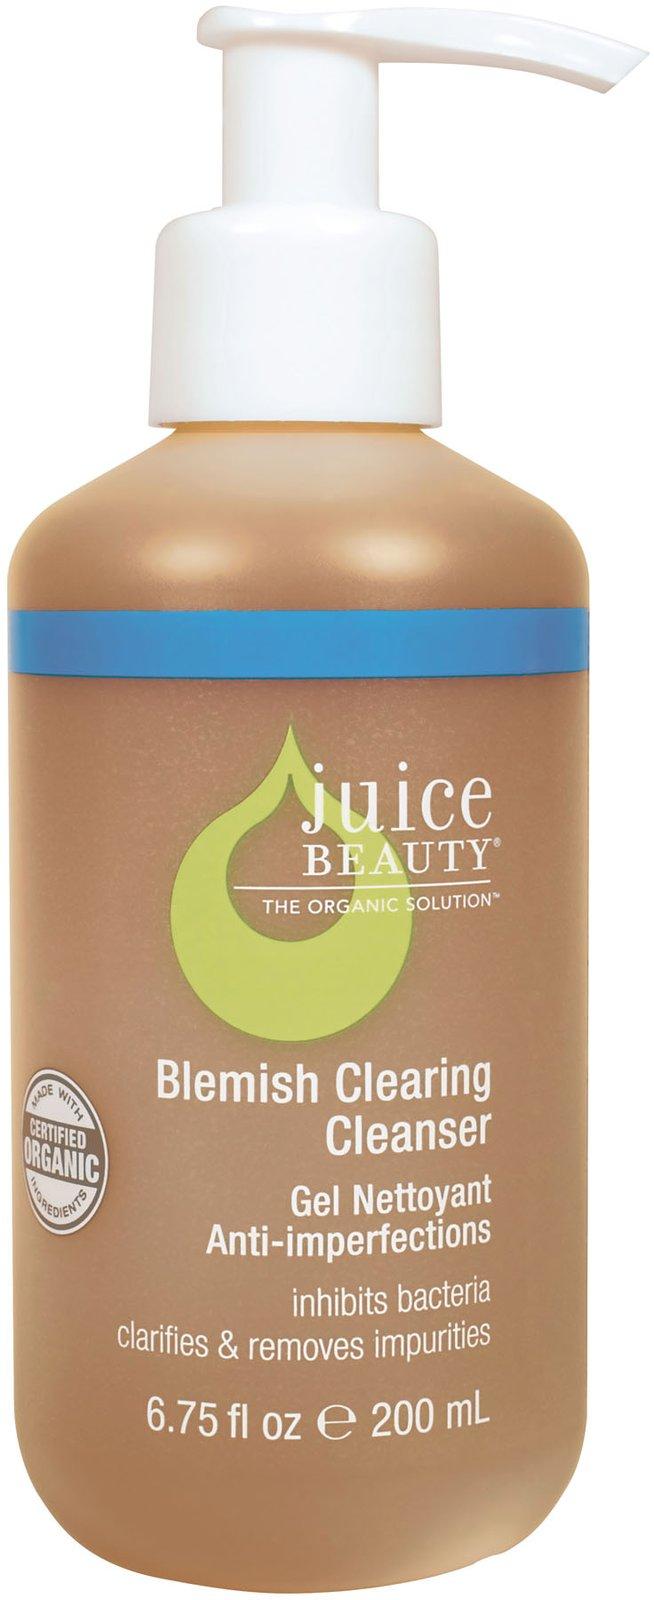 Juice Beauty Green Apple Collection Antioxidant Moisturizer